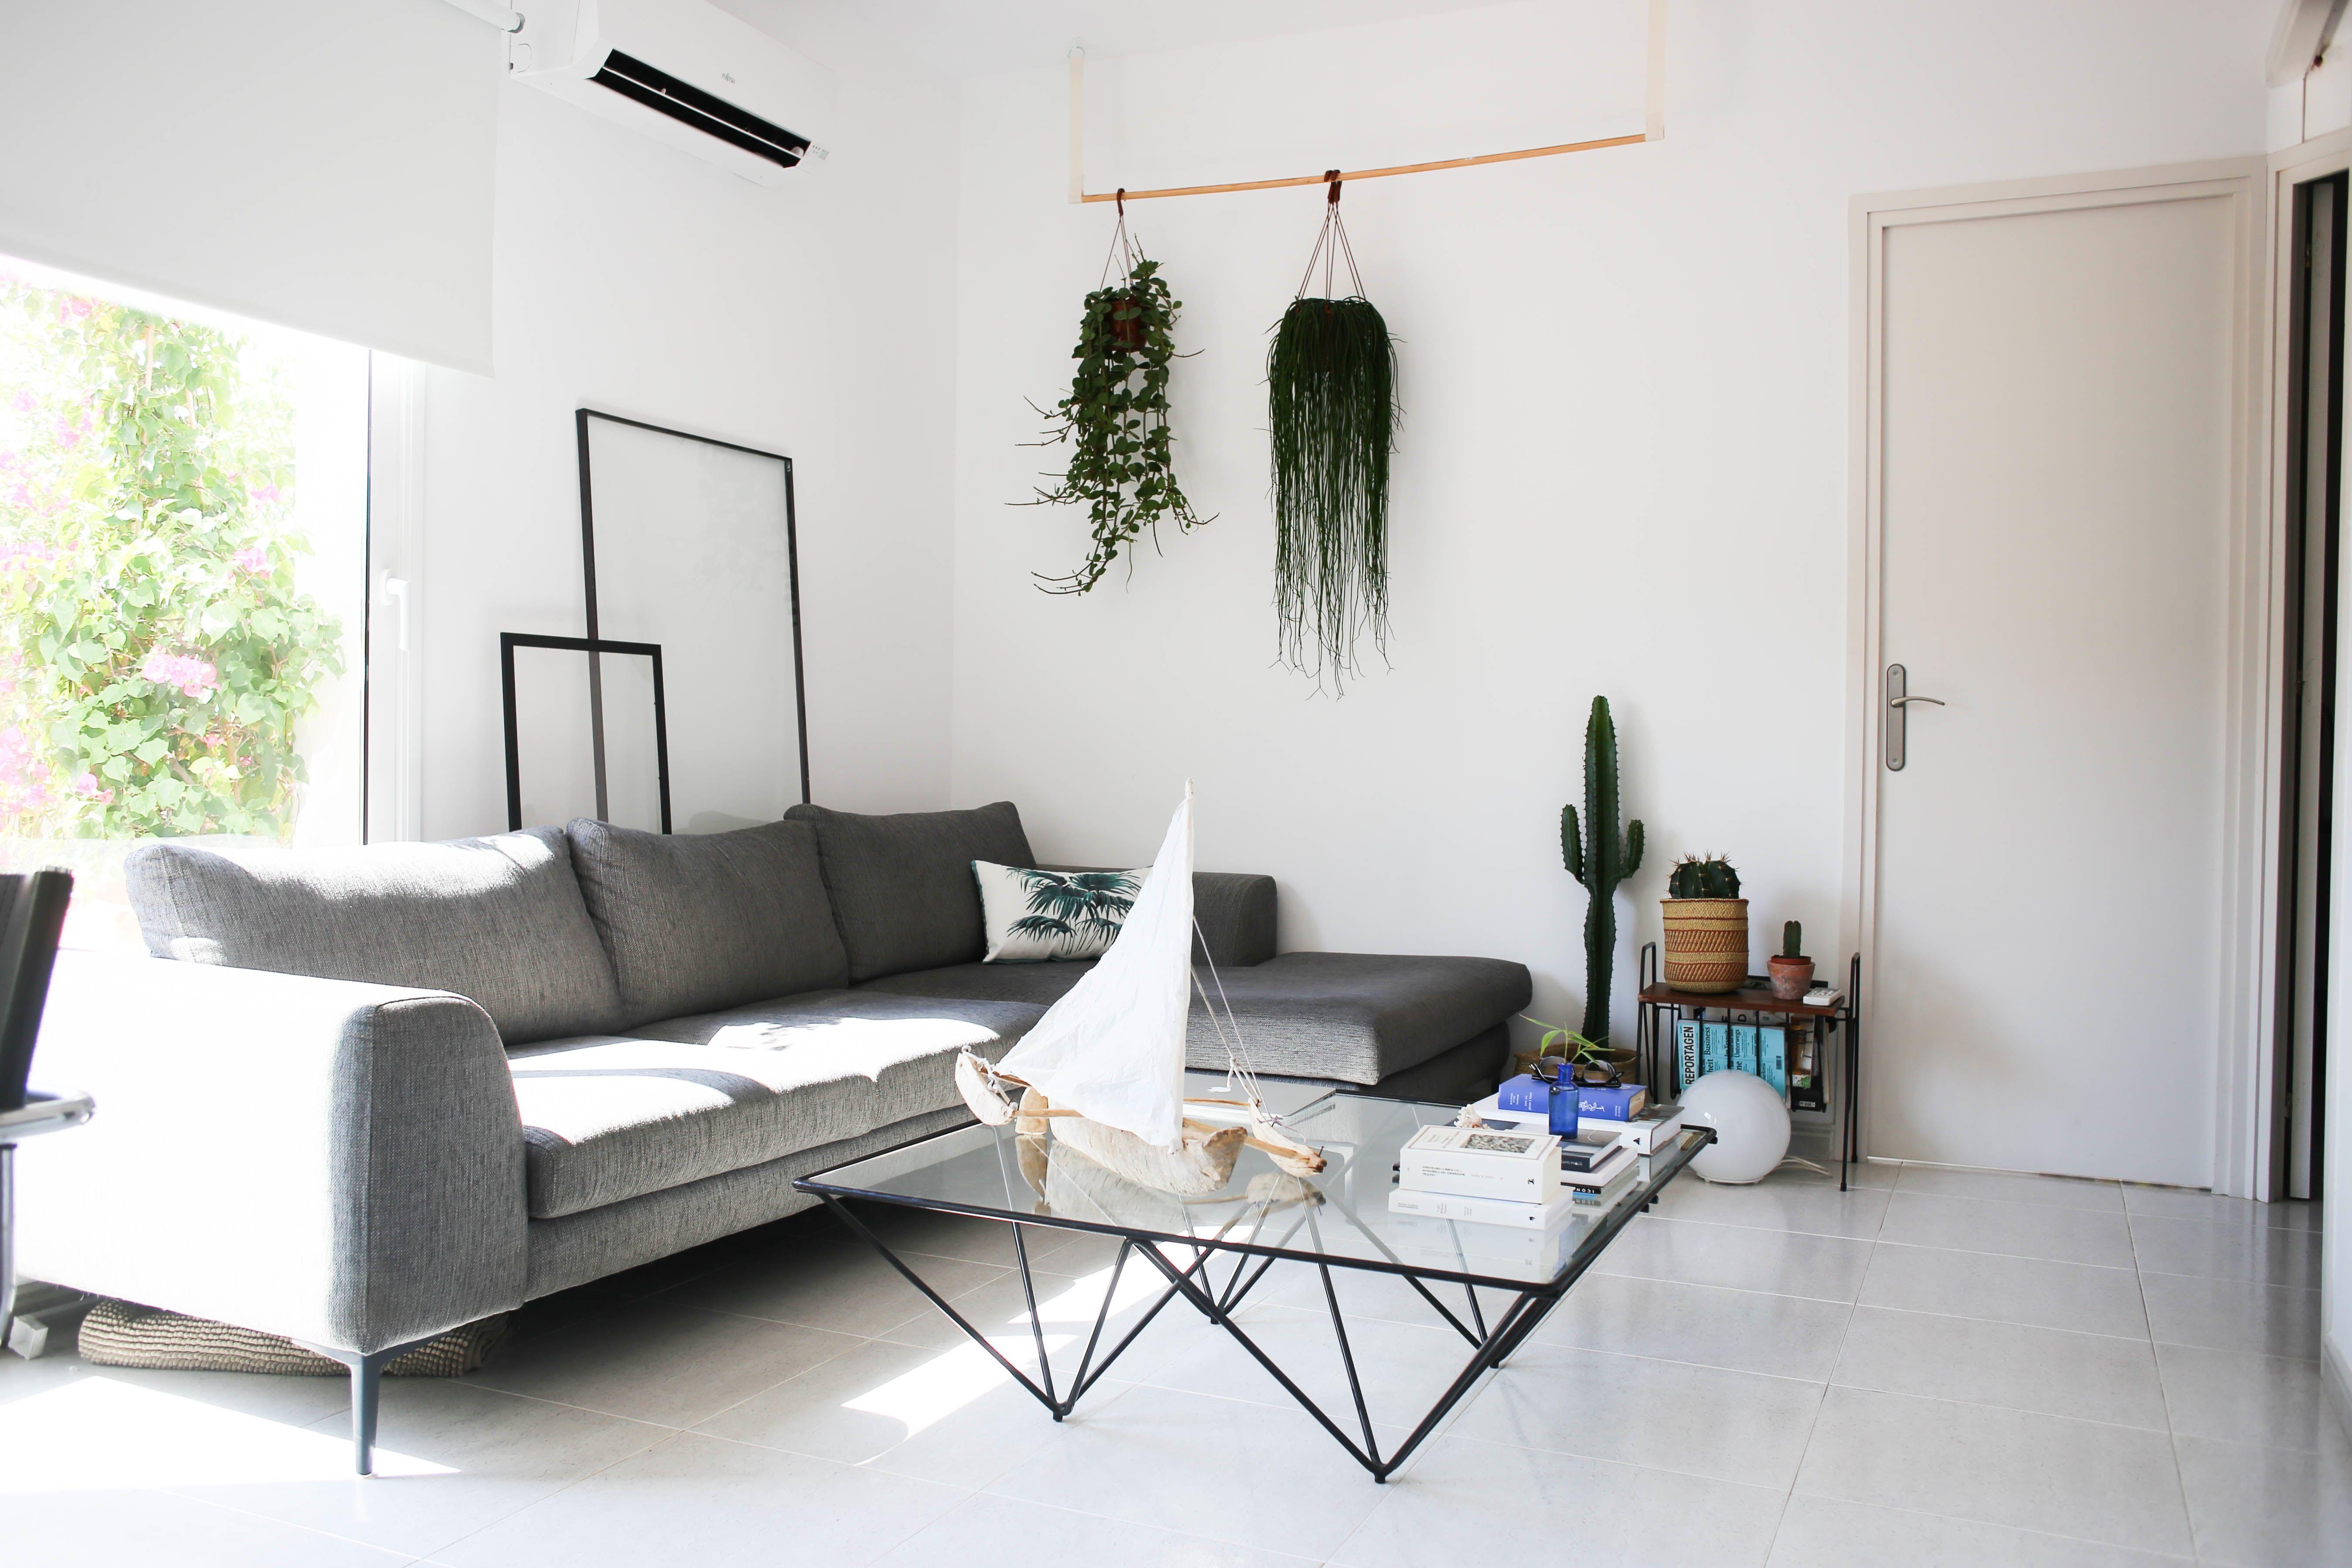 house tour an organic soulful small barcelona home living room rh pinterest com